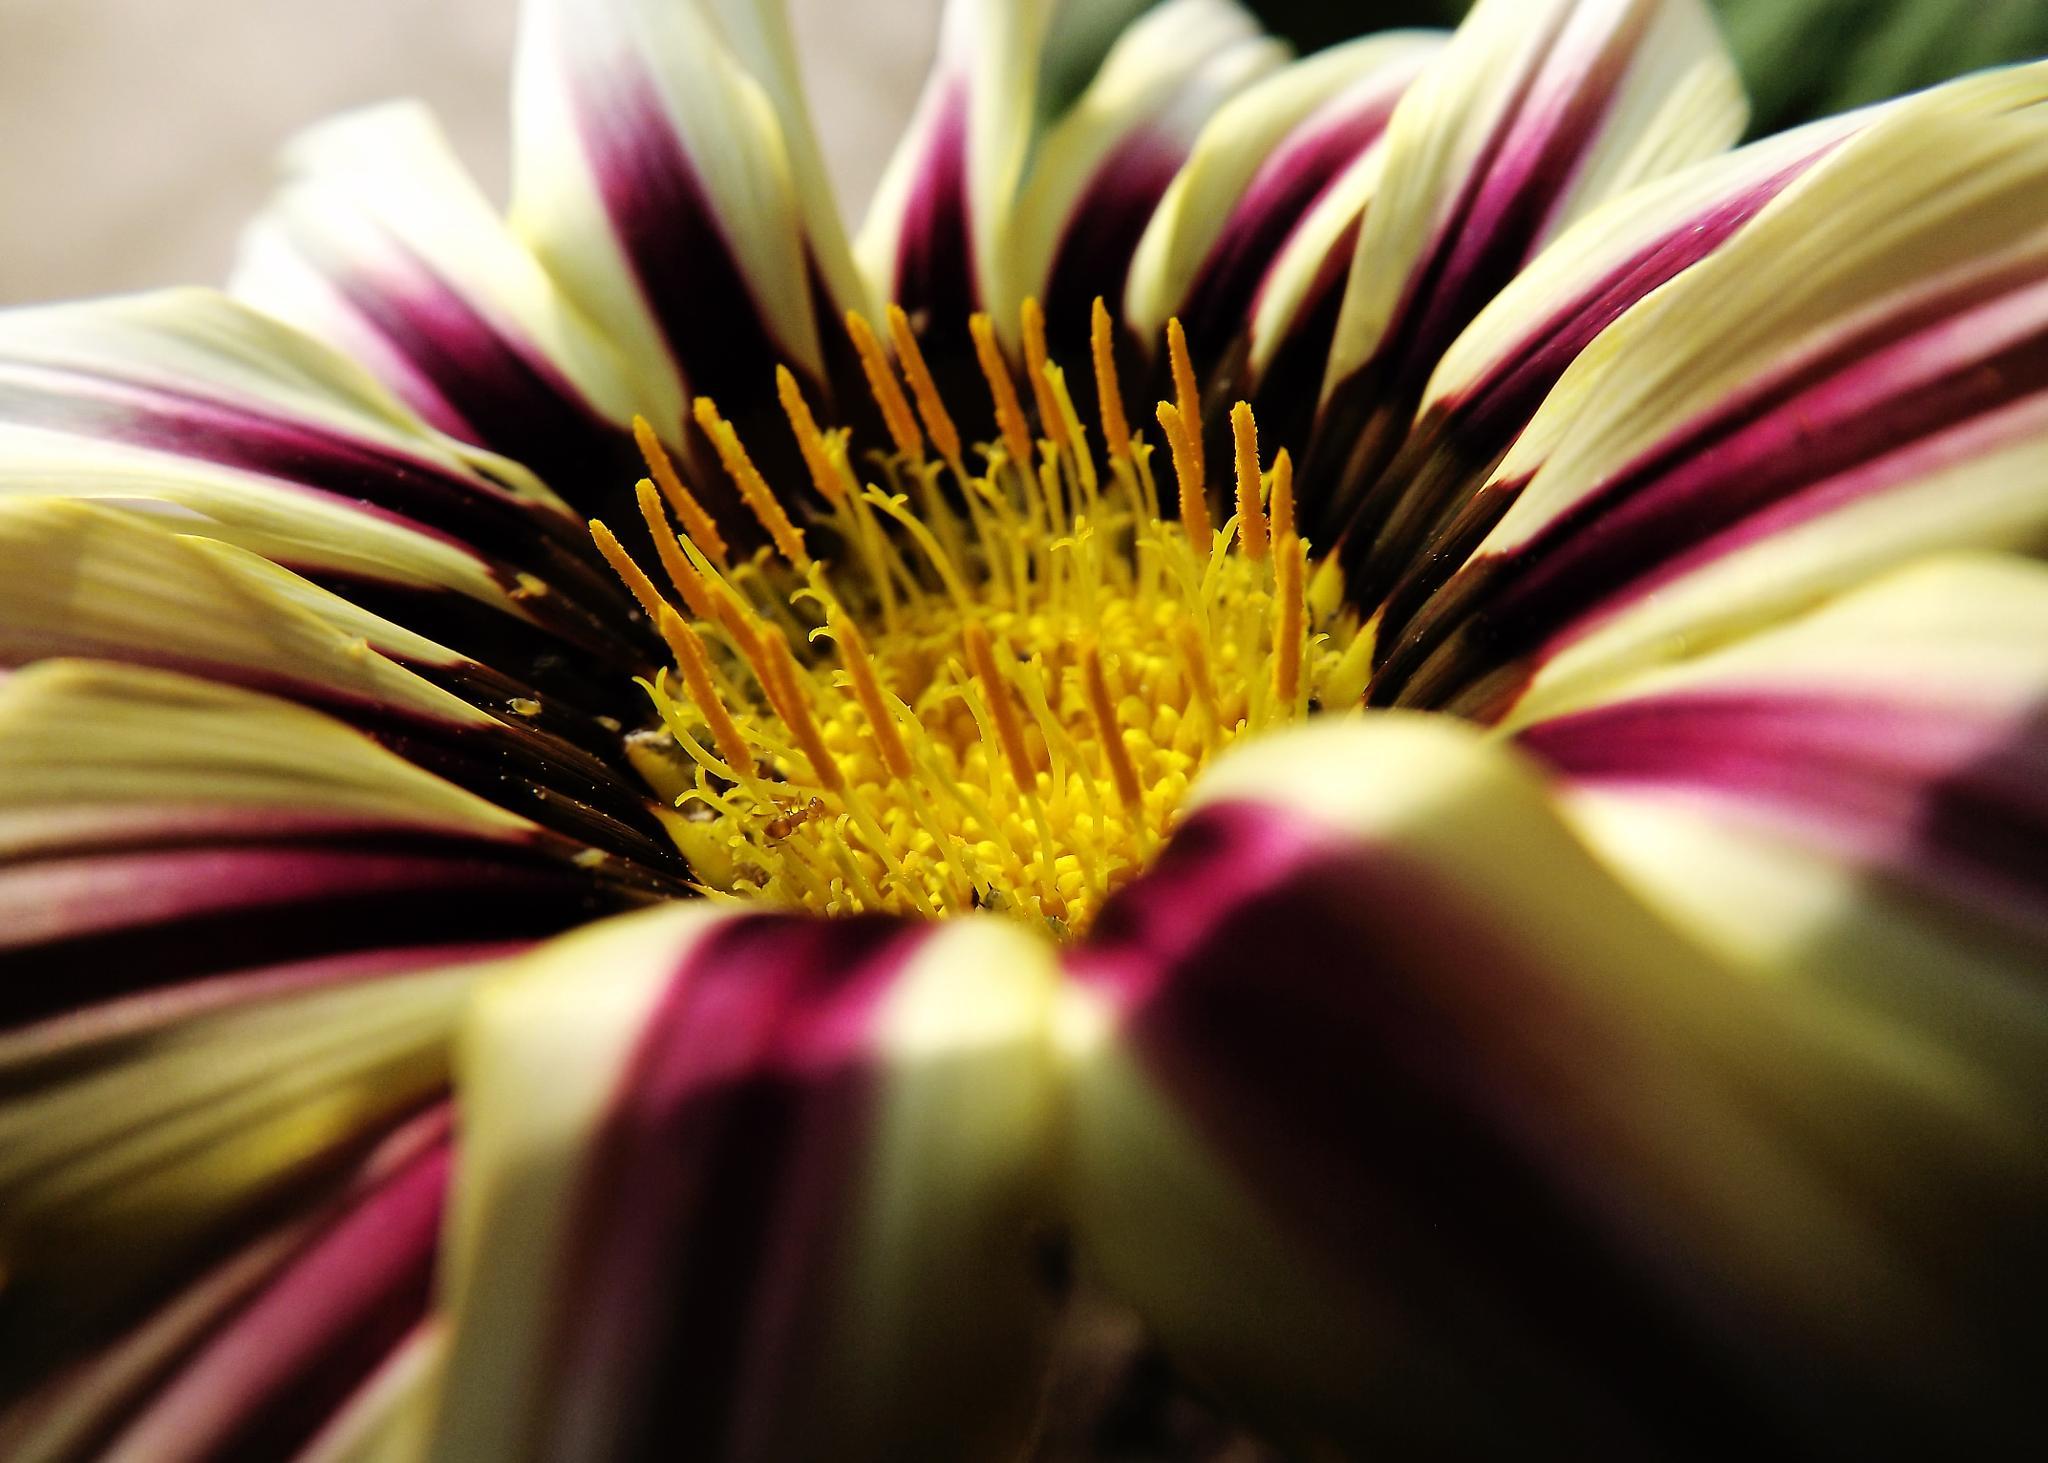 Season Flower by ARINDAM MUKHERJEE